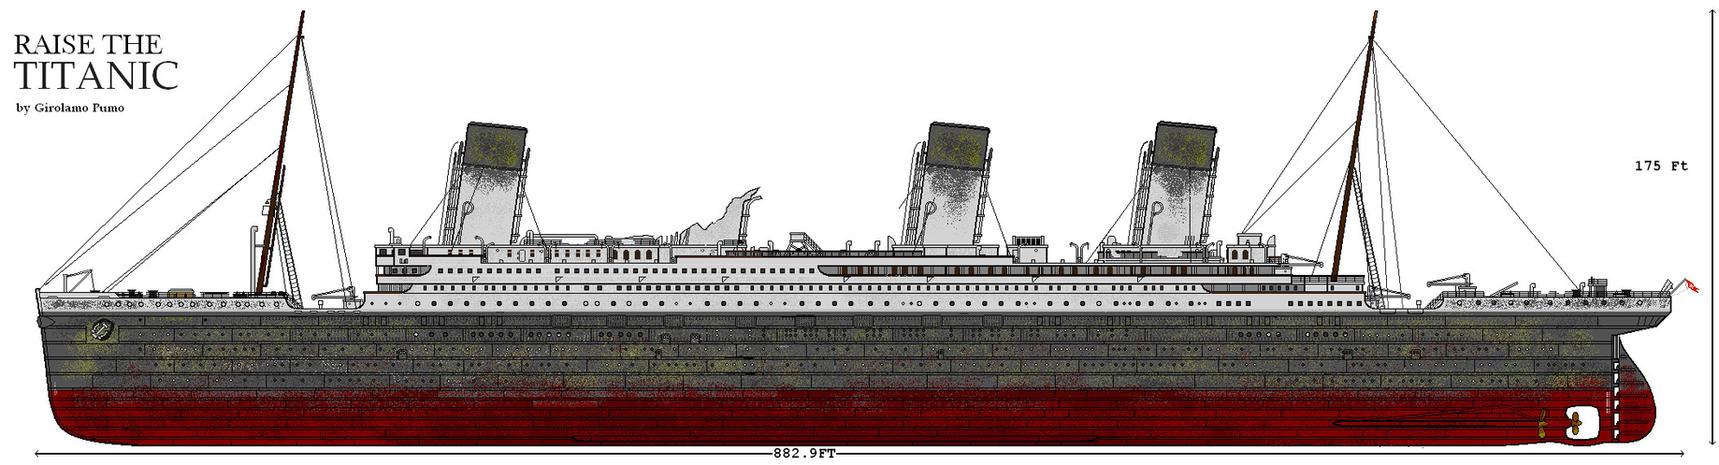 Ship Raise The Titanic By Lupin3ITA On DeviantArt